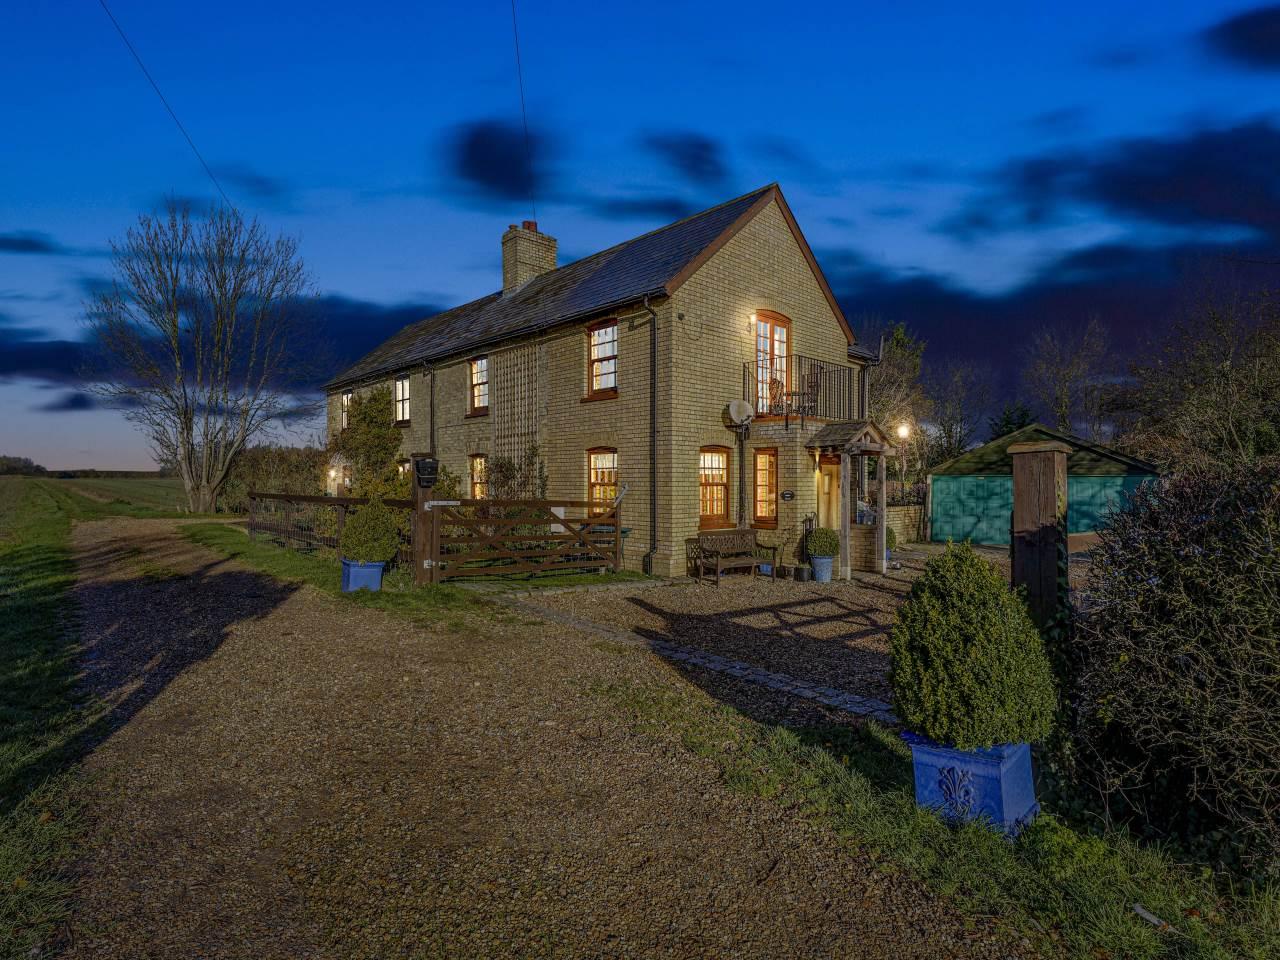 3 bed house for sale in Little Green, Guilden Morden  - Property Image 1